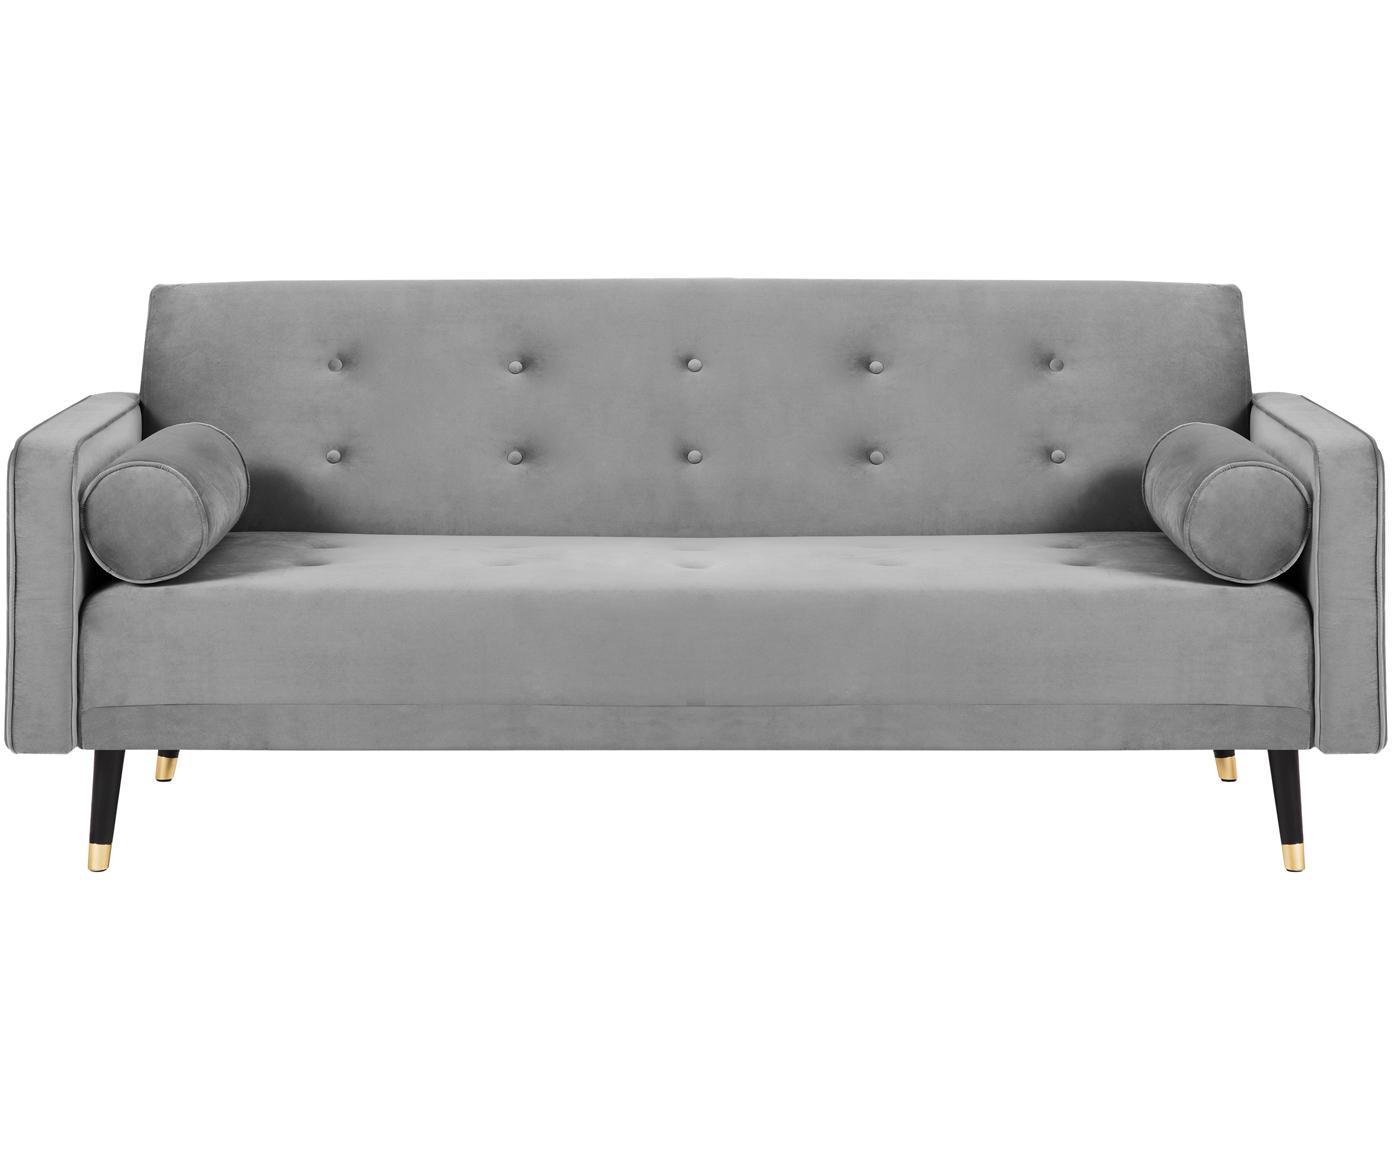 Samt-Schlafsofa Gia (3-Sitzer), Bezug: Polyestersamt, Rahmen: Massives Kiefernholz, Füße: Buchenholz, lackiert, Samt Hellgrau, B 212 x T 93 cm